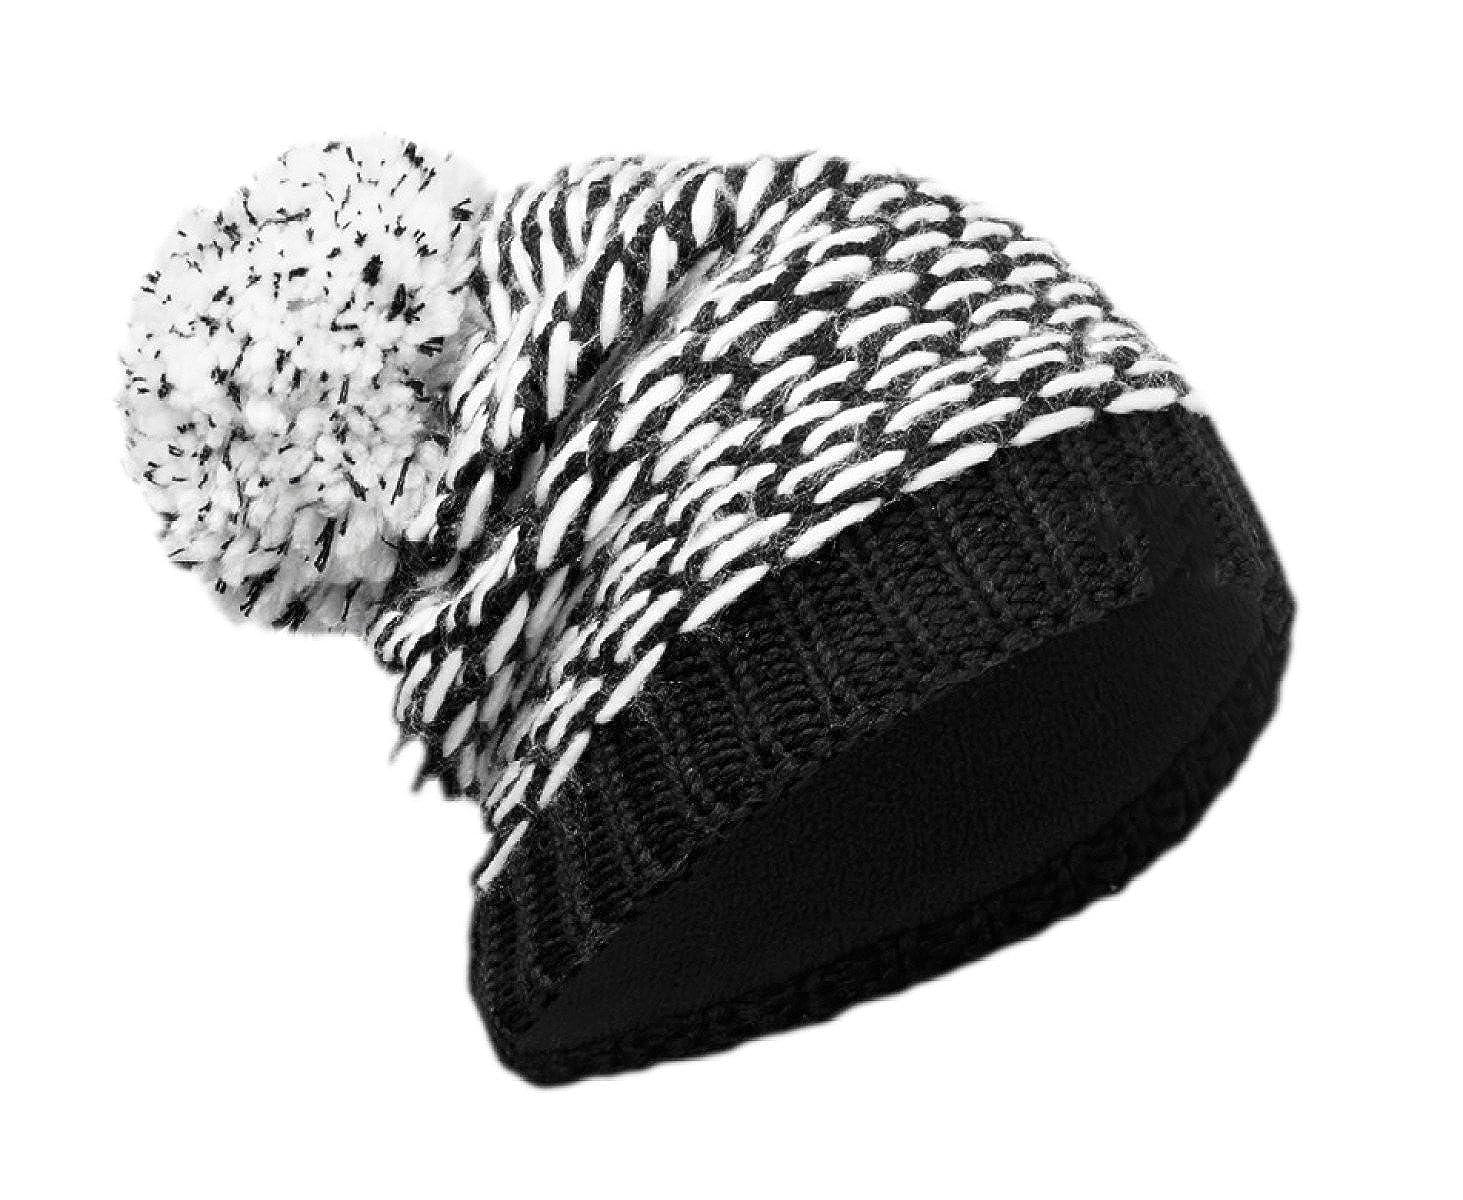 snfgoij Herren Hüte Ski Caps Winter Russische Leder Bomber Hut Fleece Caps Outdoor Ski Windschutz Stricken Hüte Lätzchen